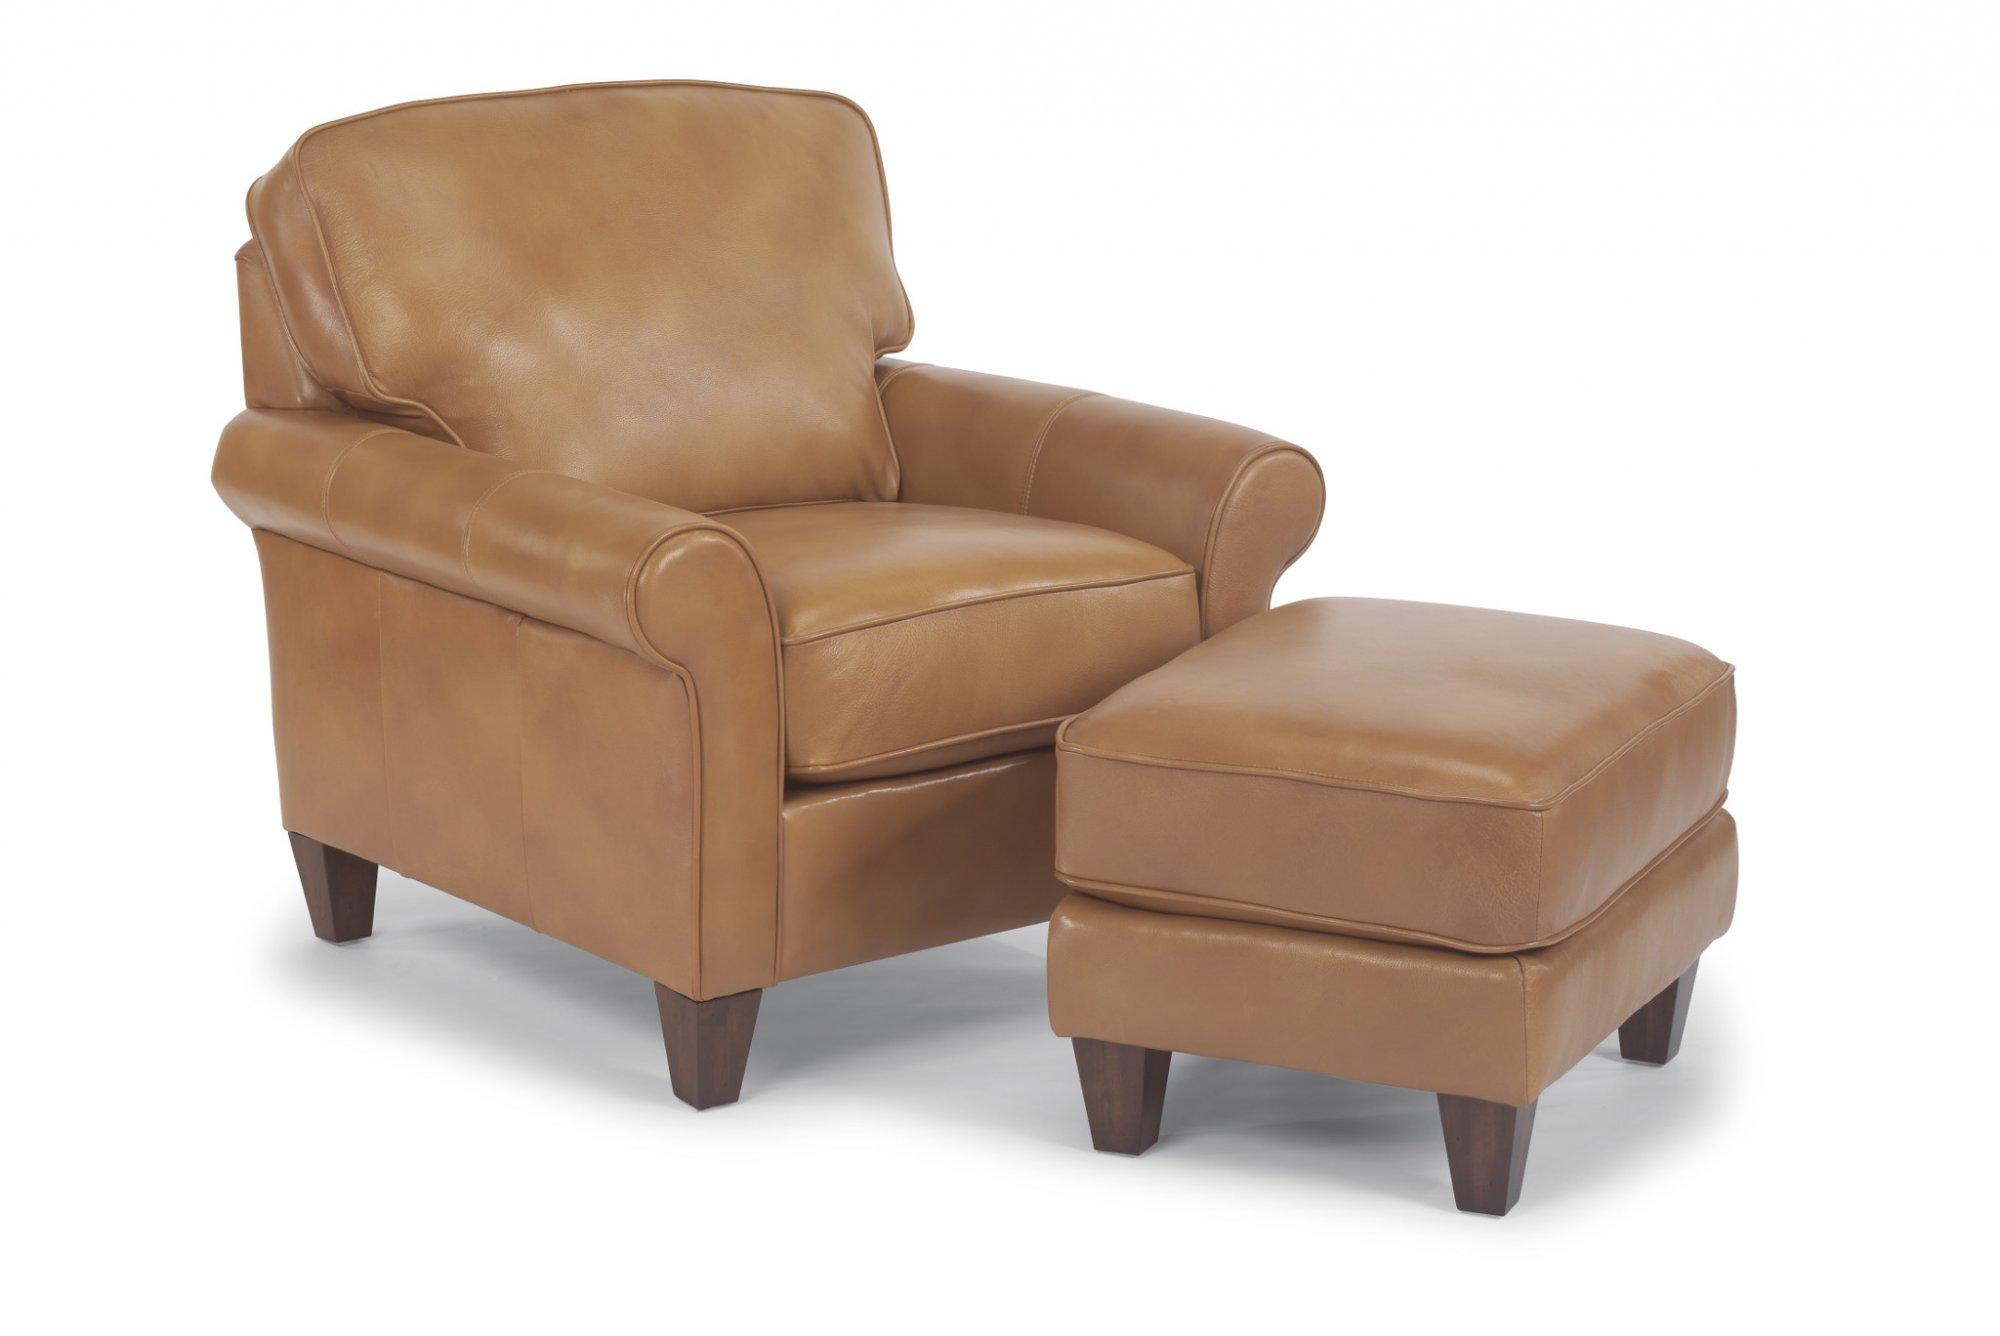 Flexsteel Westside  Leather Ottoman